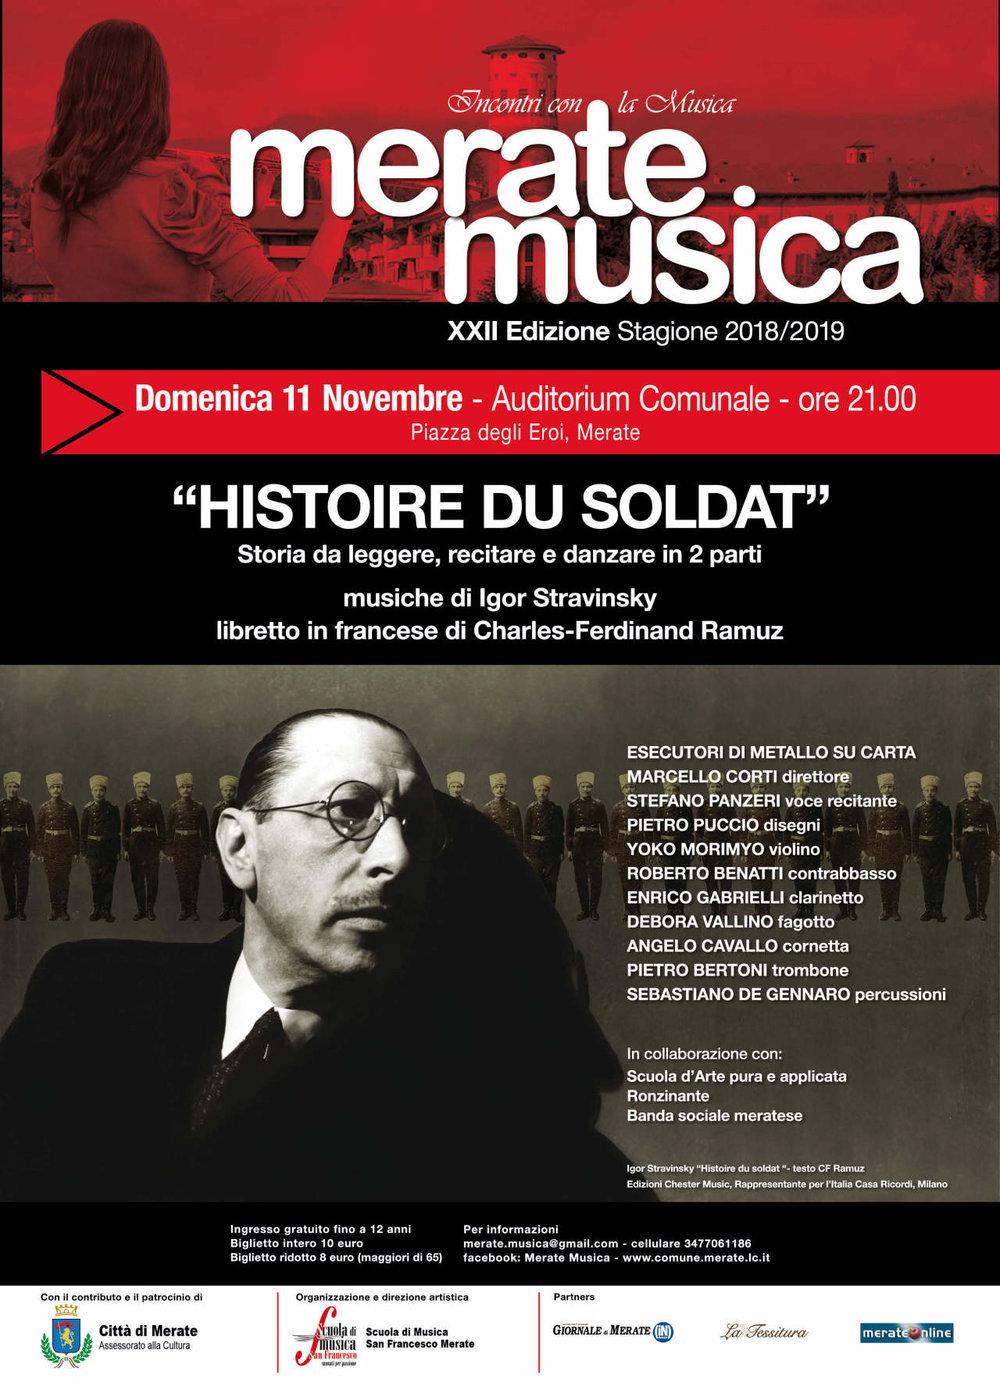 MerateMusica_Manifesto+11+nov+versione+ok.jpg